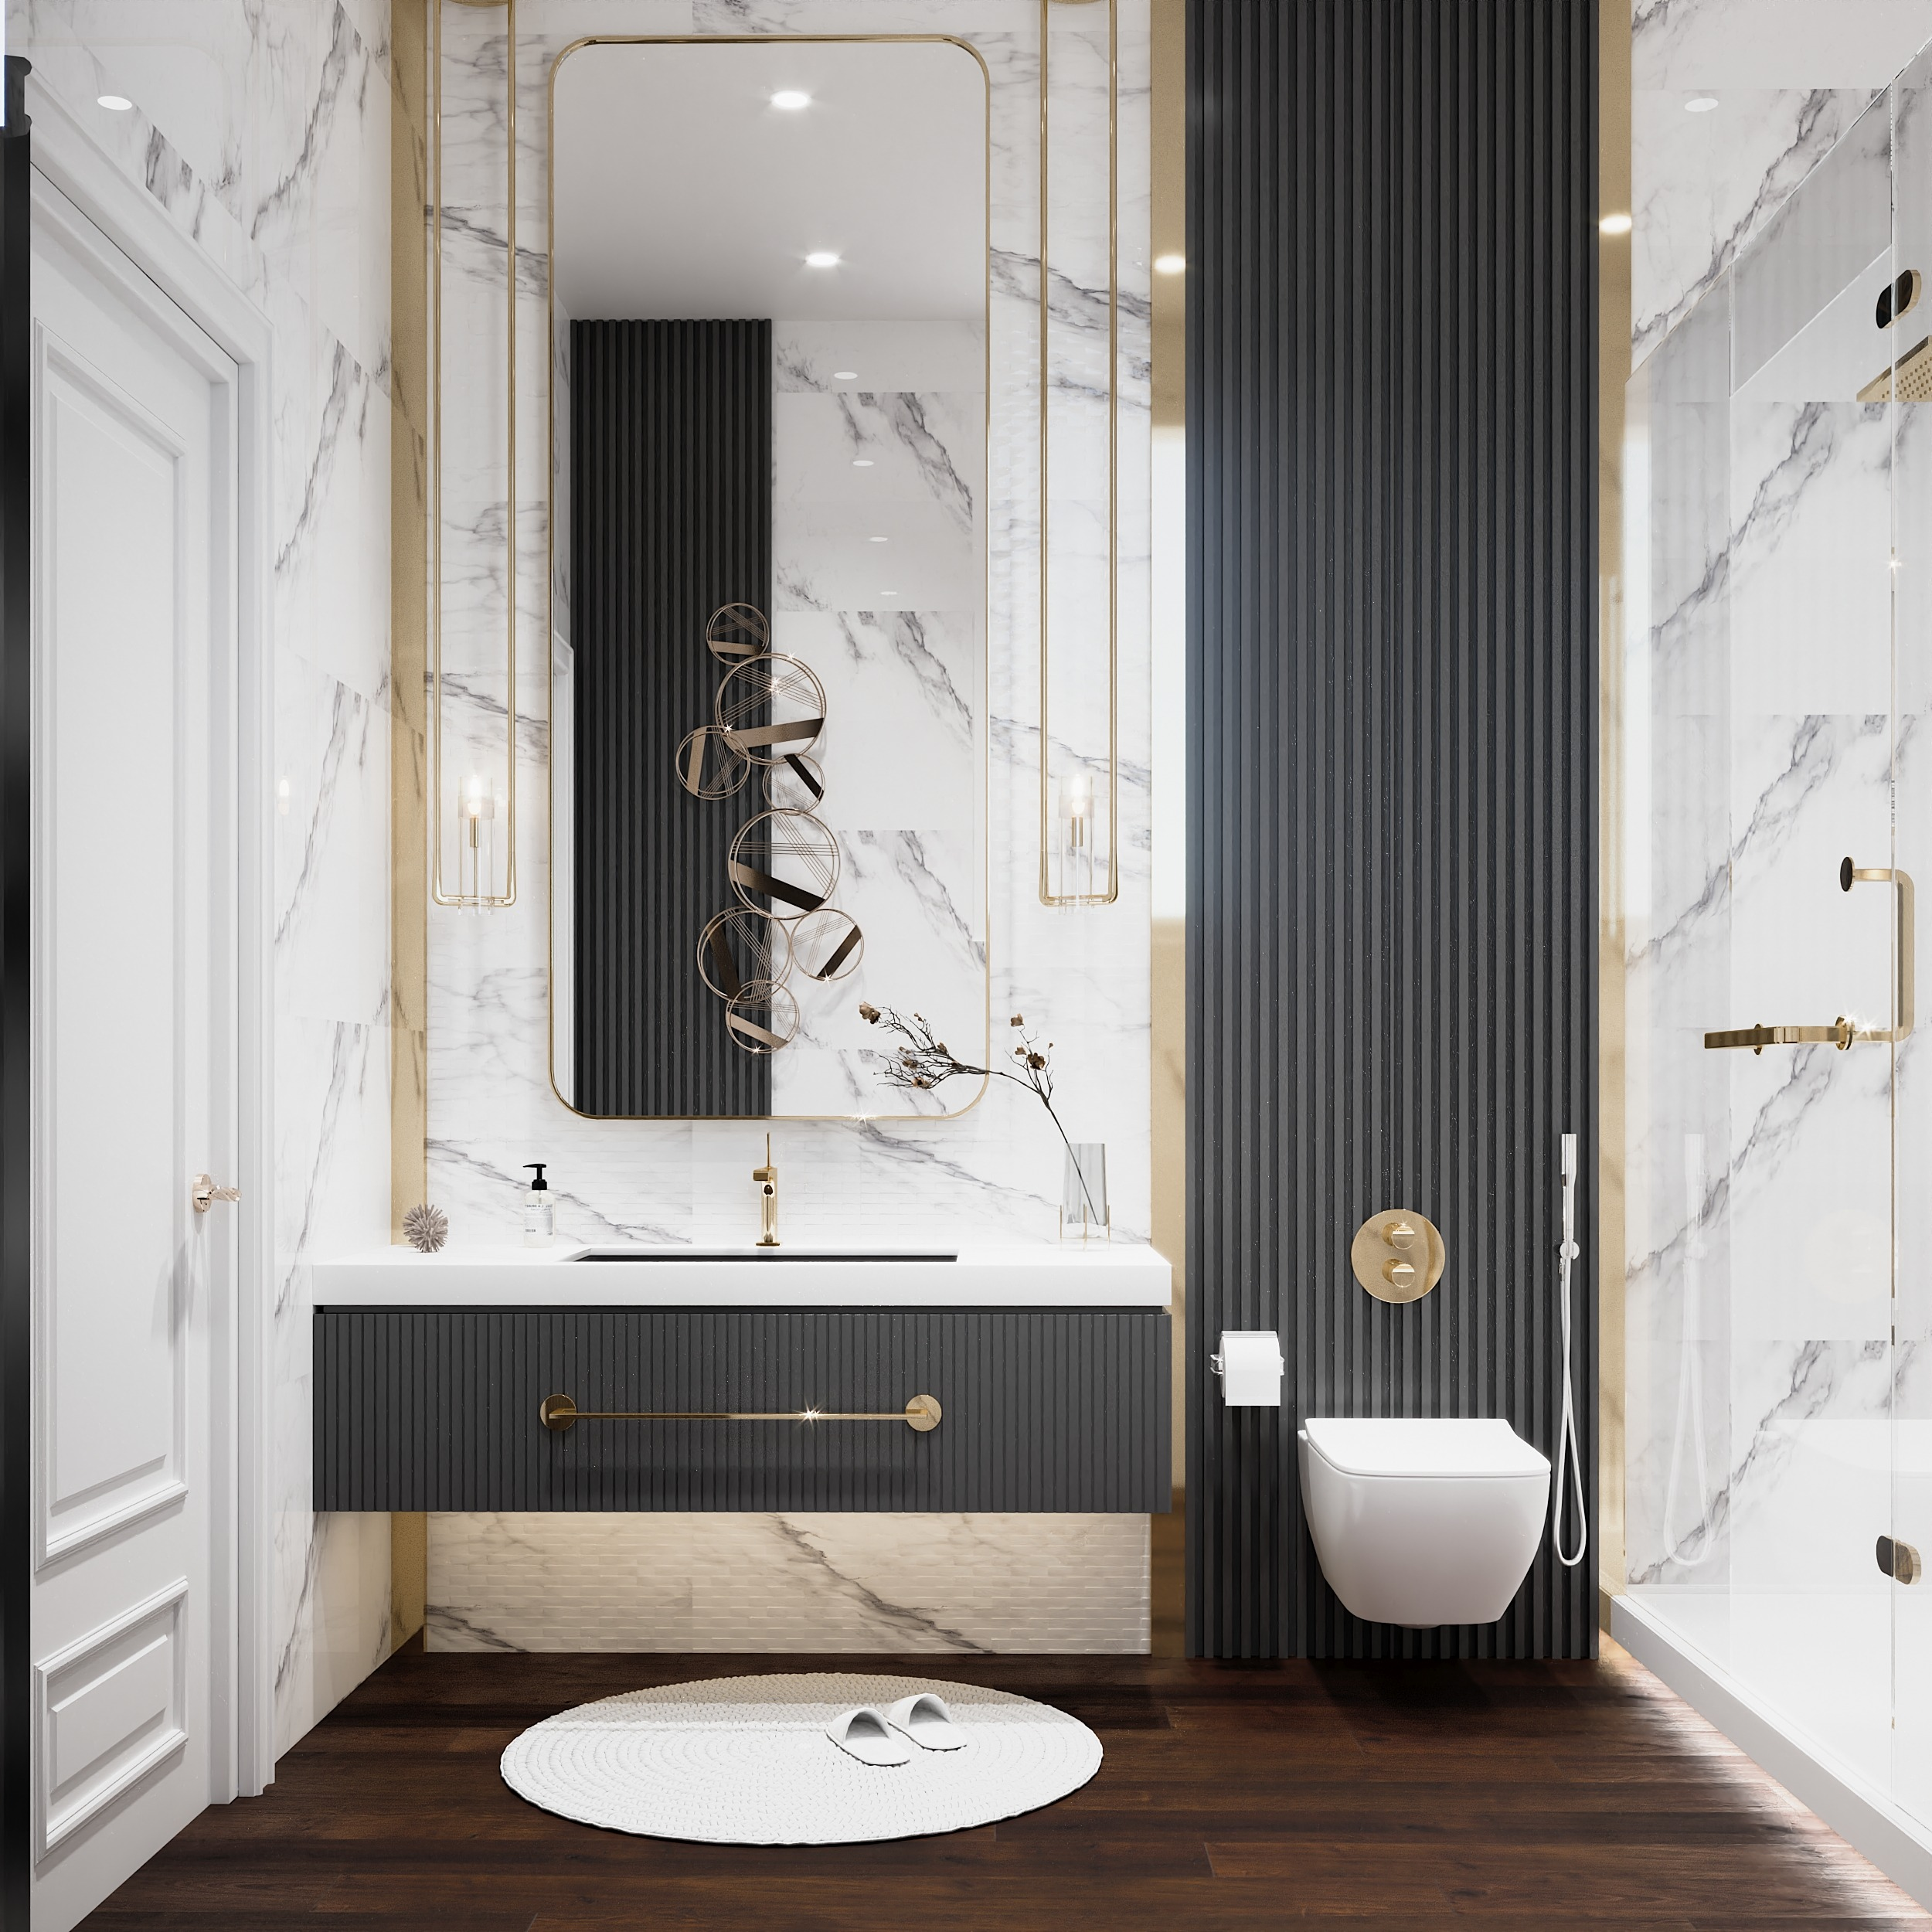 WELL DESIGNED BATHROOMS -ELEGANT - WELL DESIGNED BATHROOM - BLACK WOODEN STRIPS - GOLD